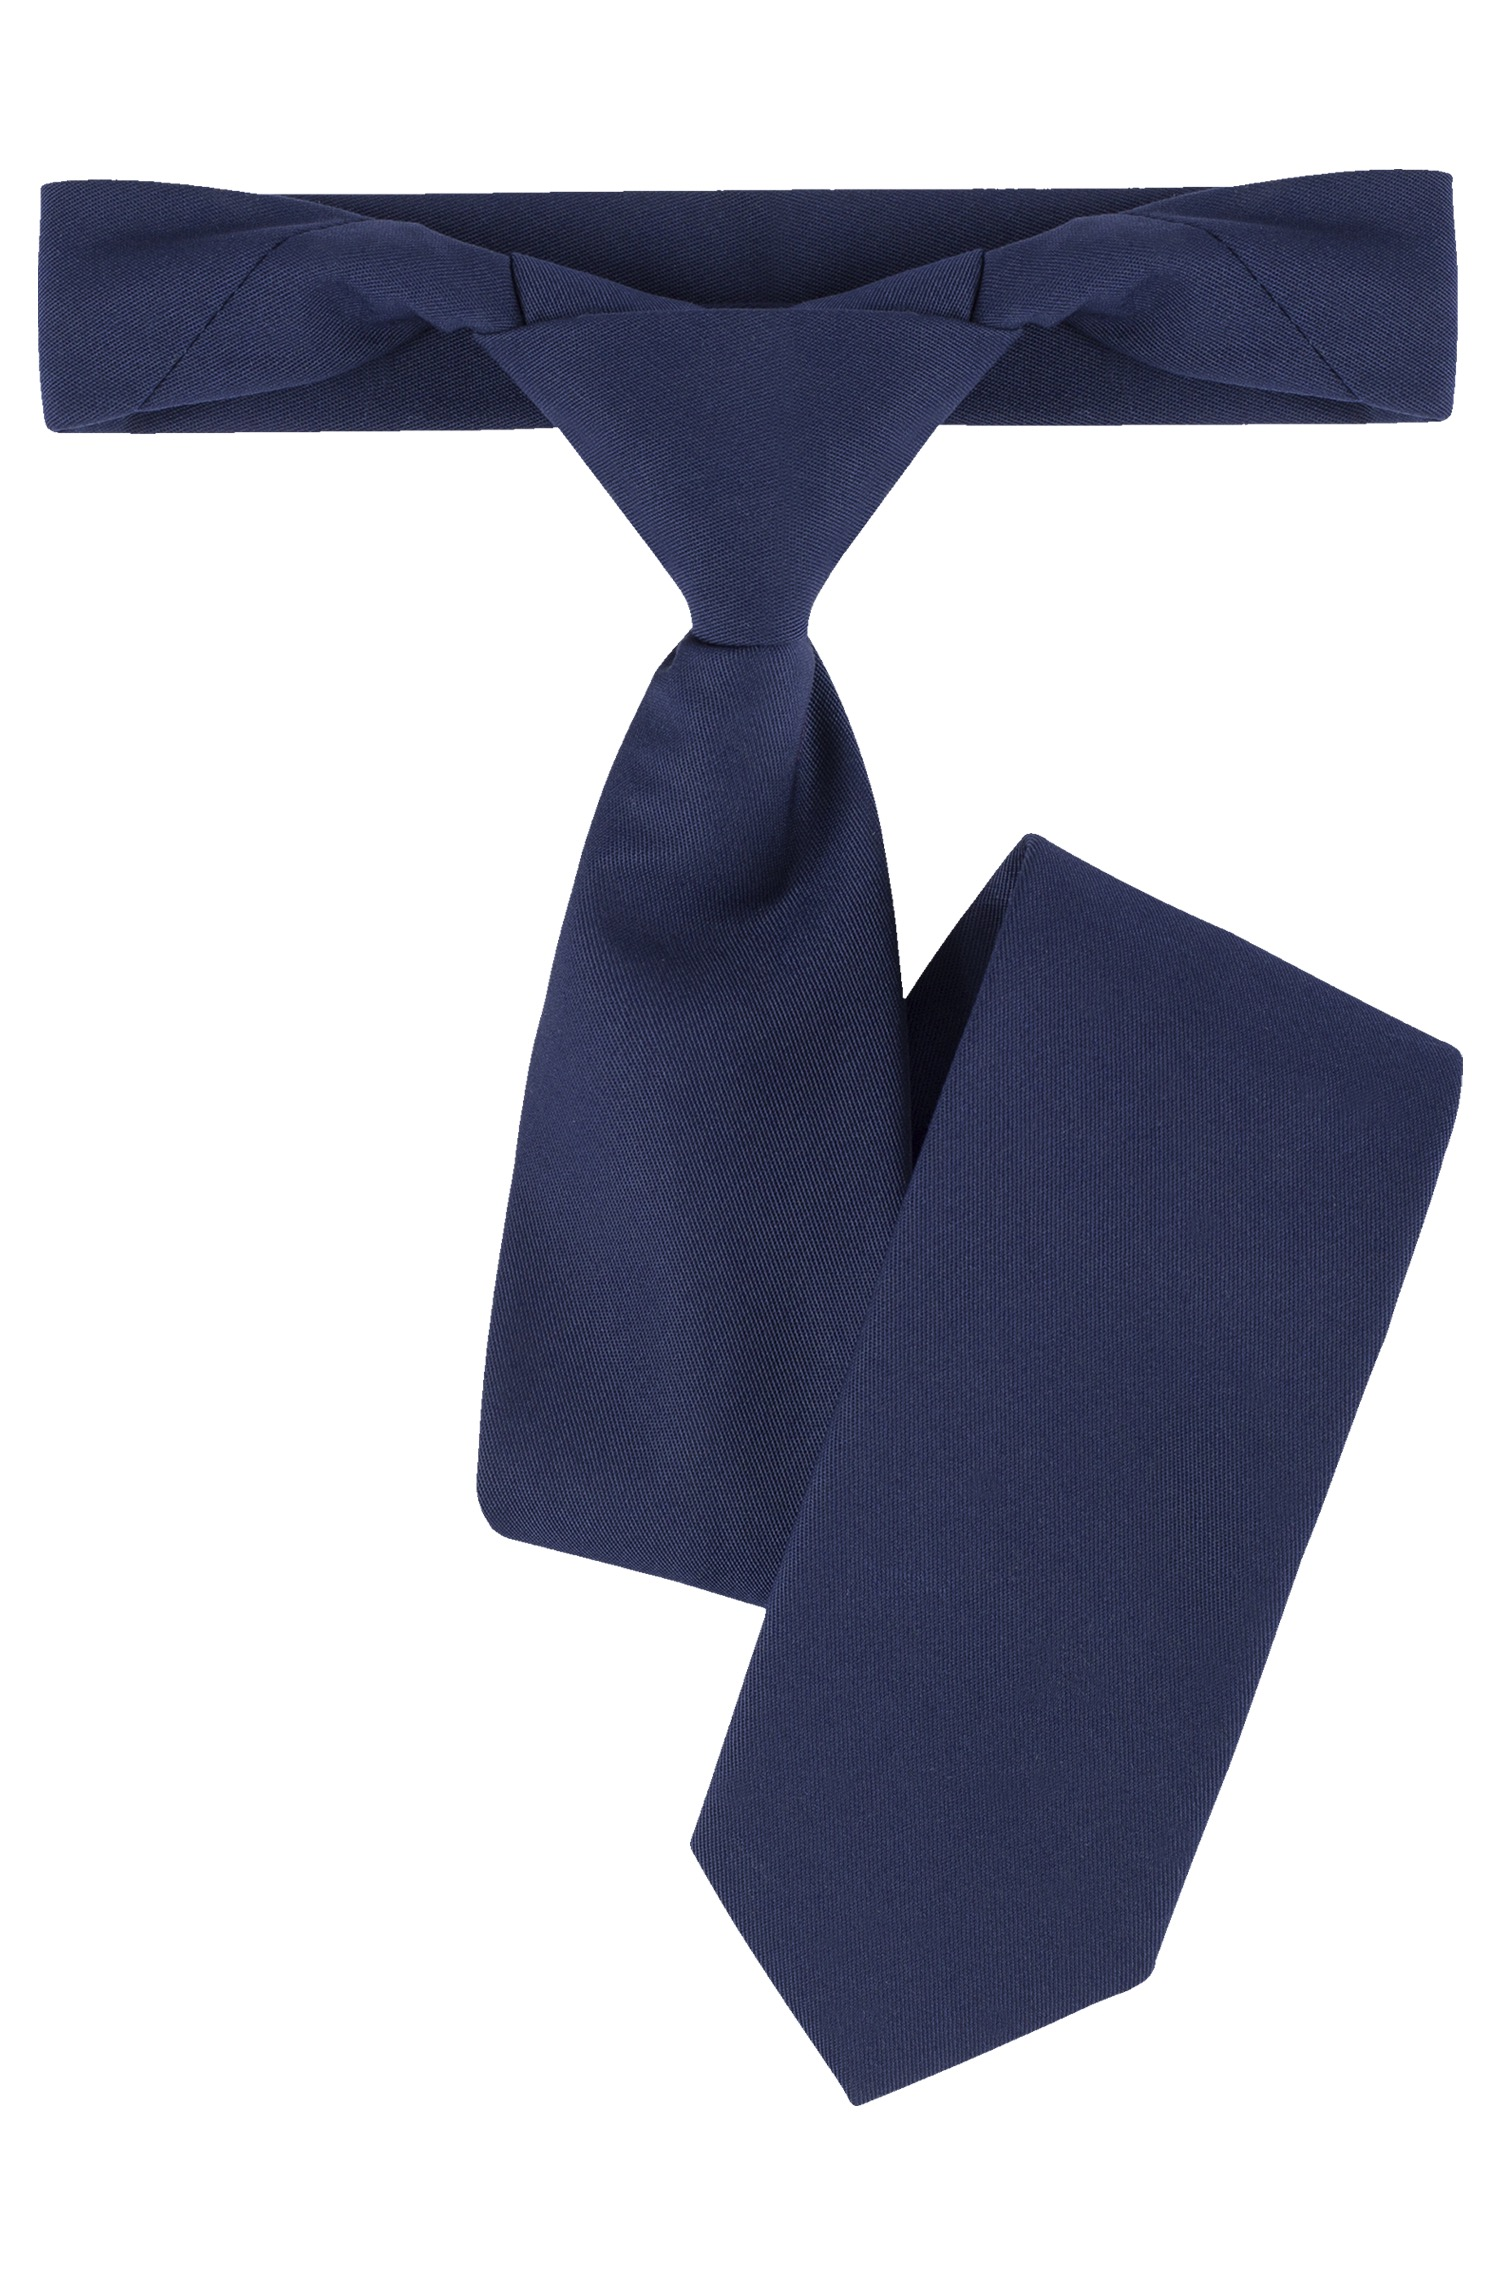 Greiff Ruck-Zuck Krawatte 6921.6400